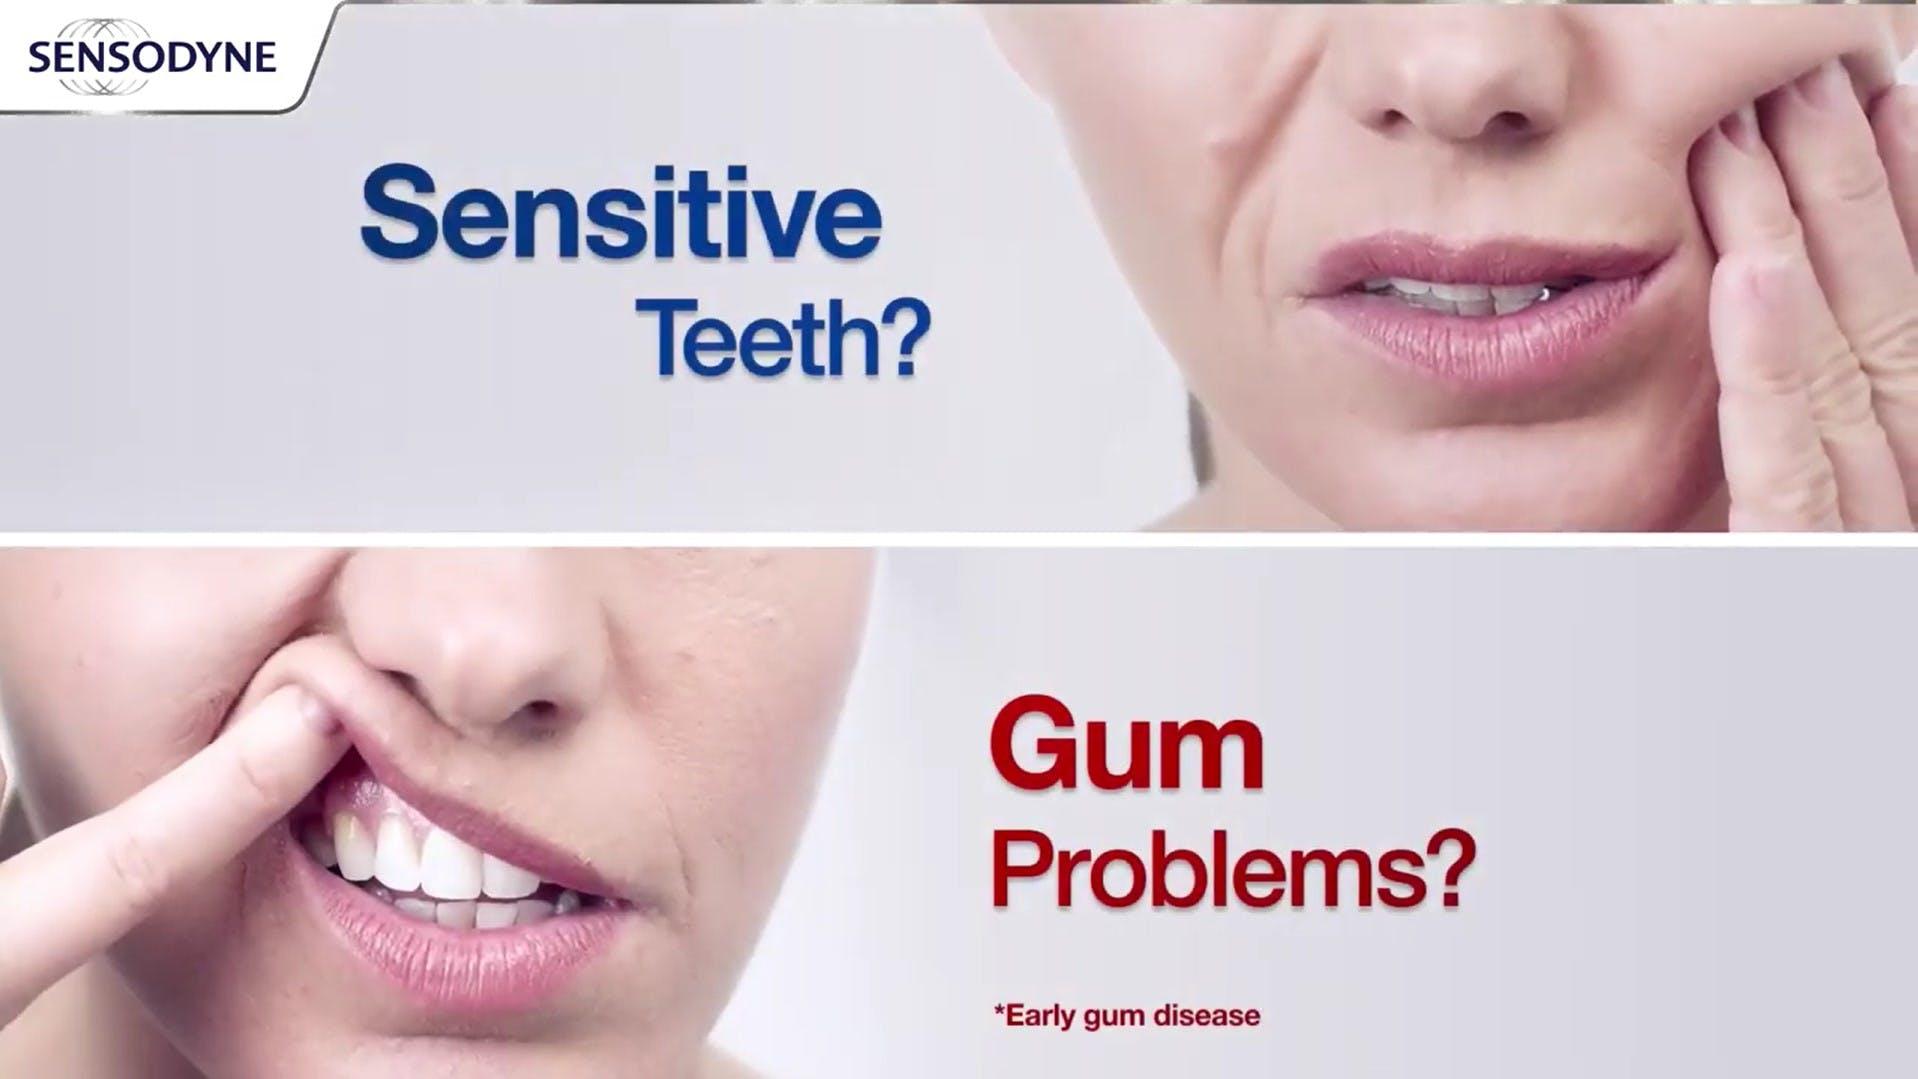 Sensitive teeth and gum problems